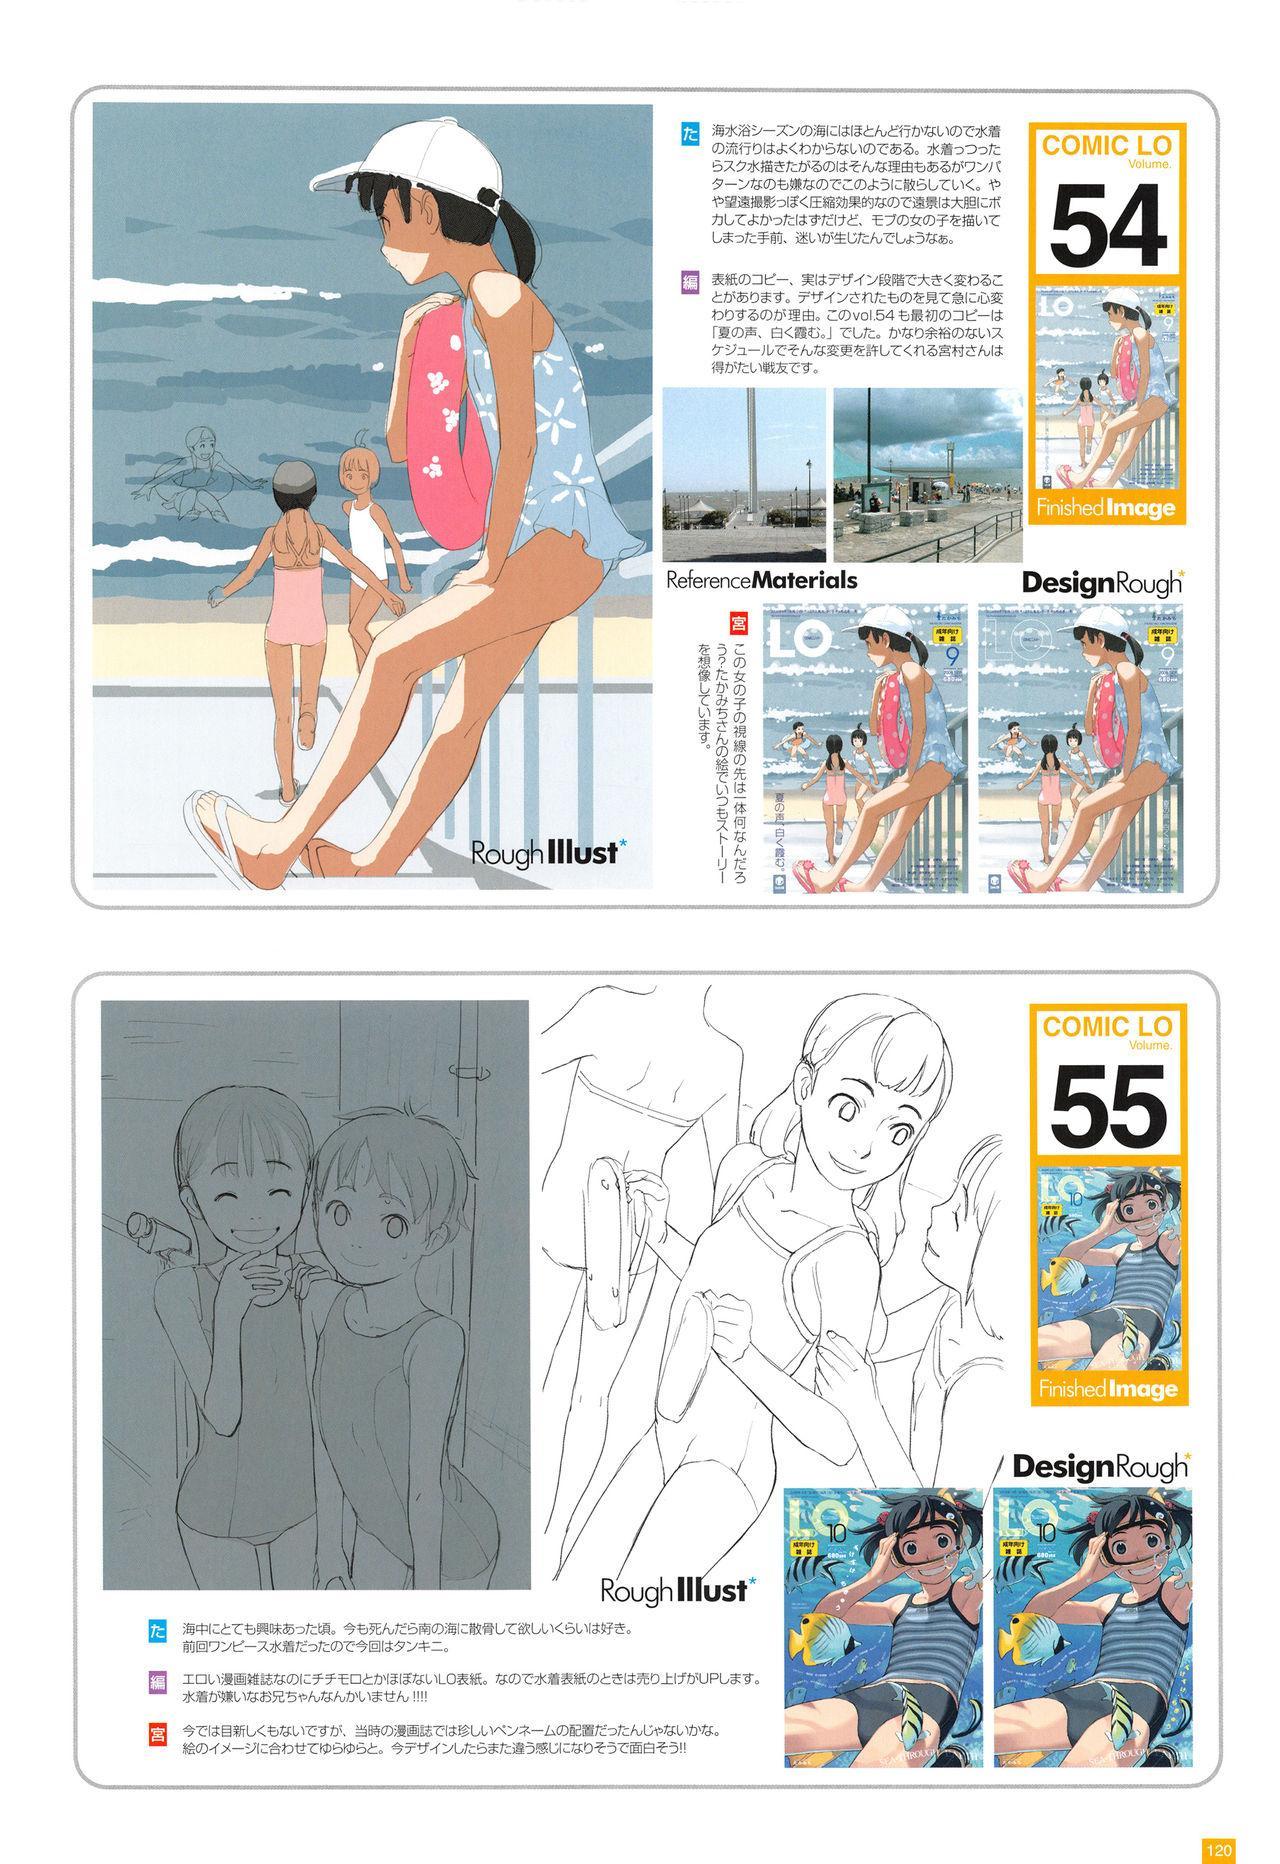 LO Artbook 2-A TAKAMICHI LOOP WORKS 122